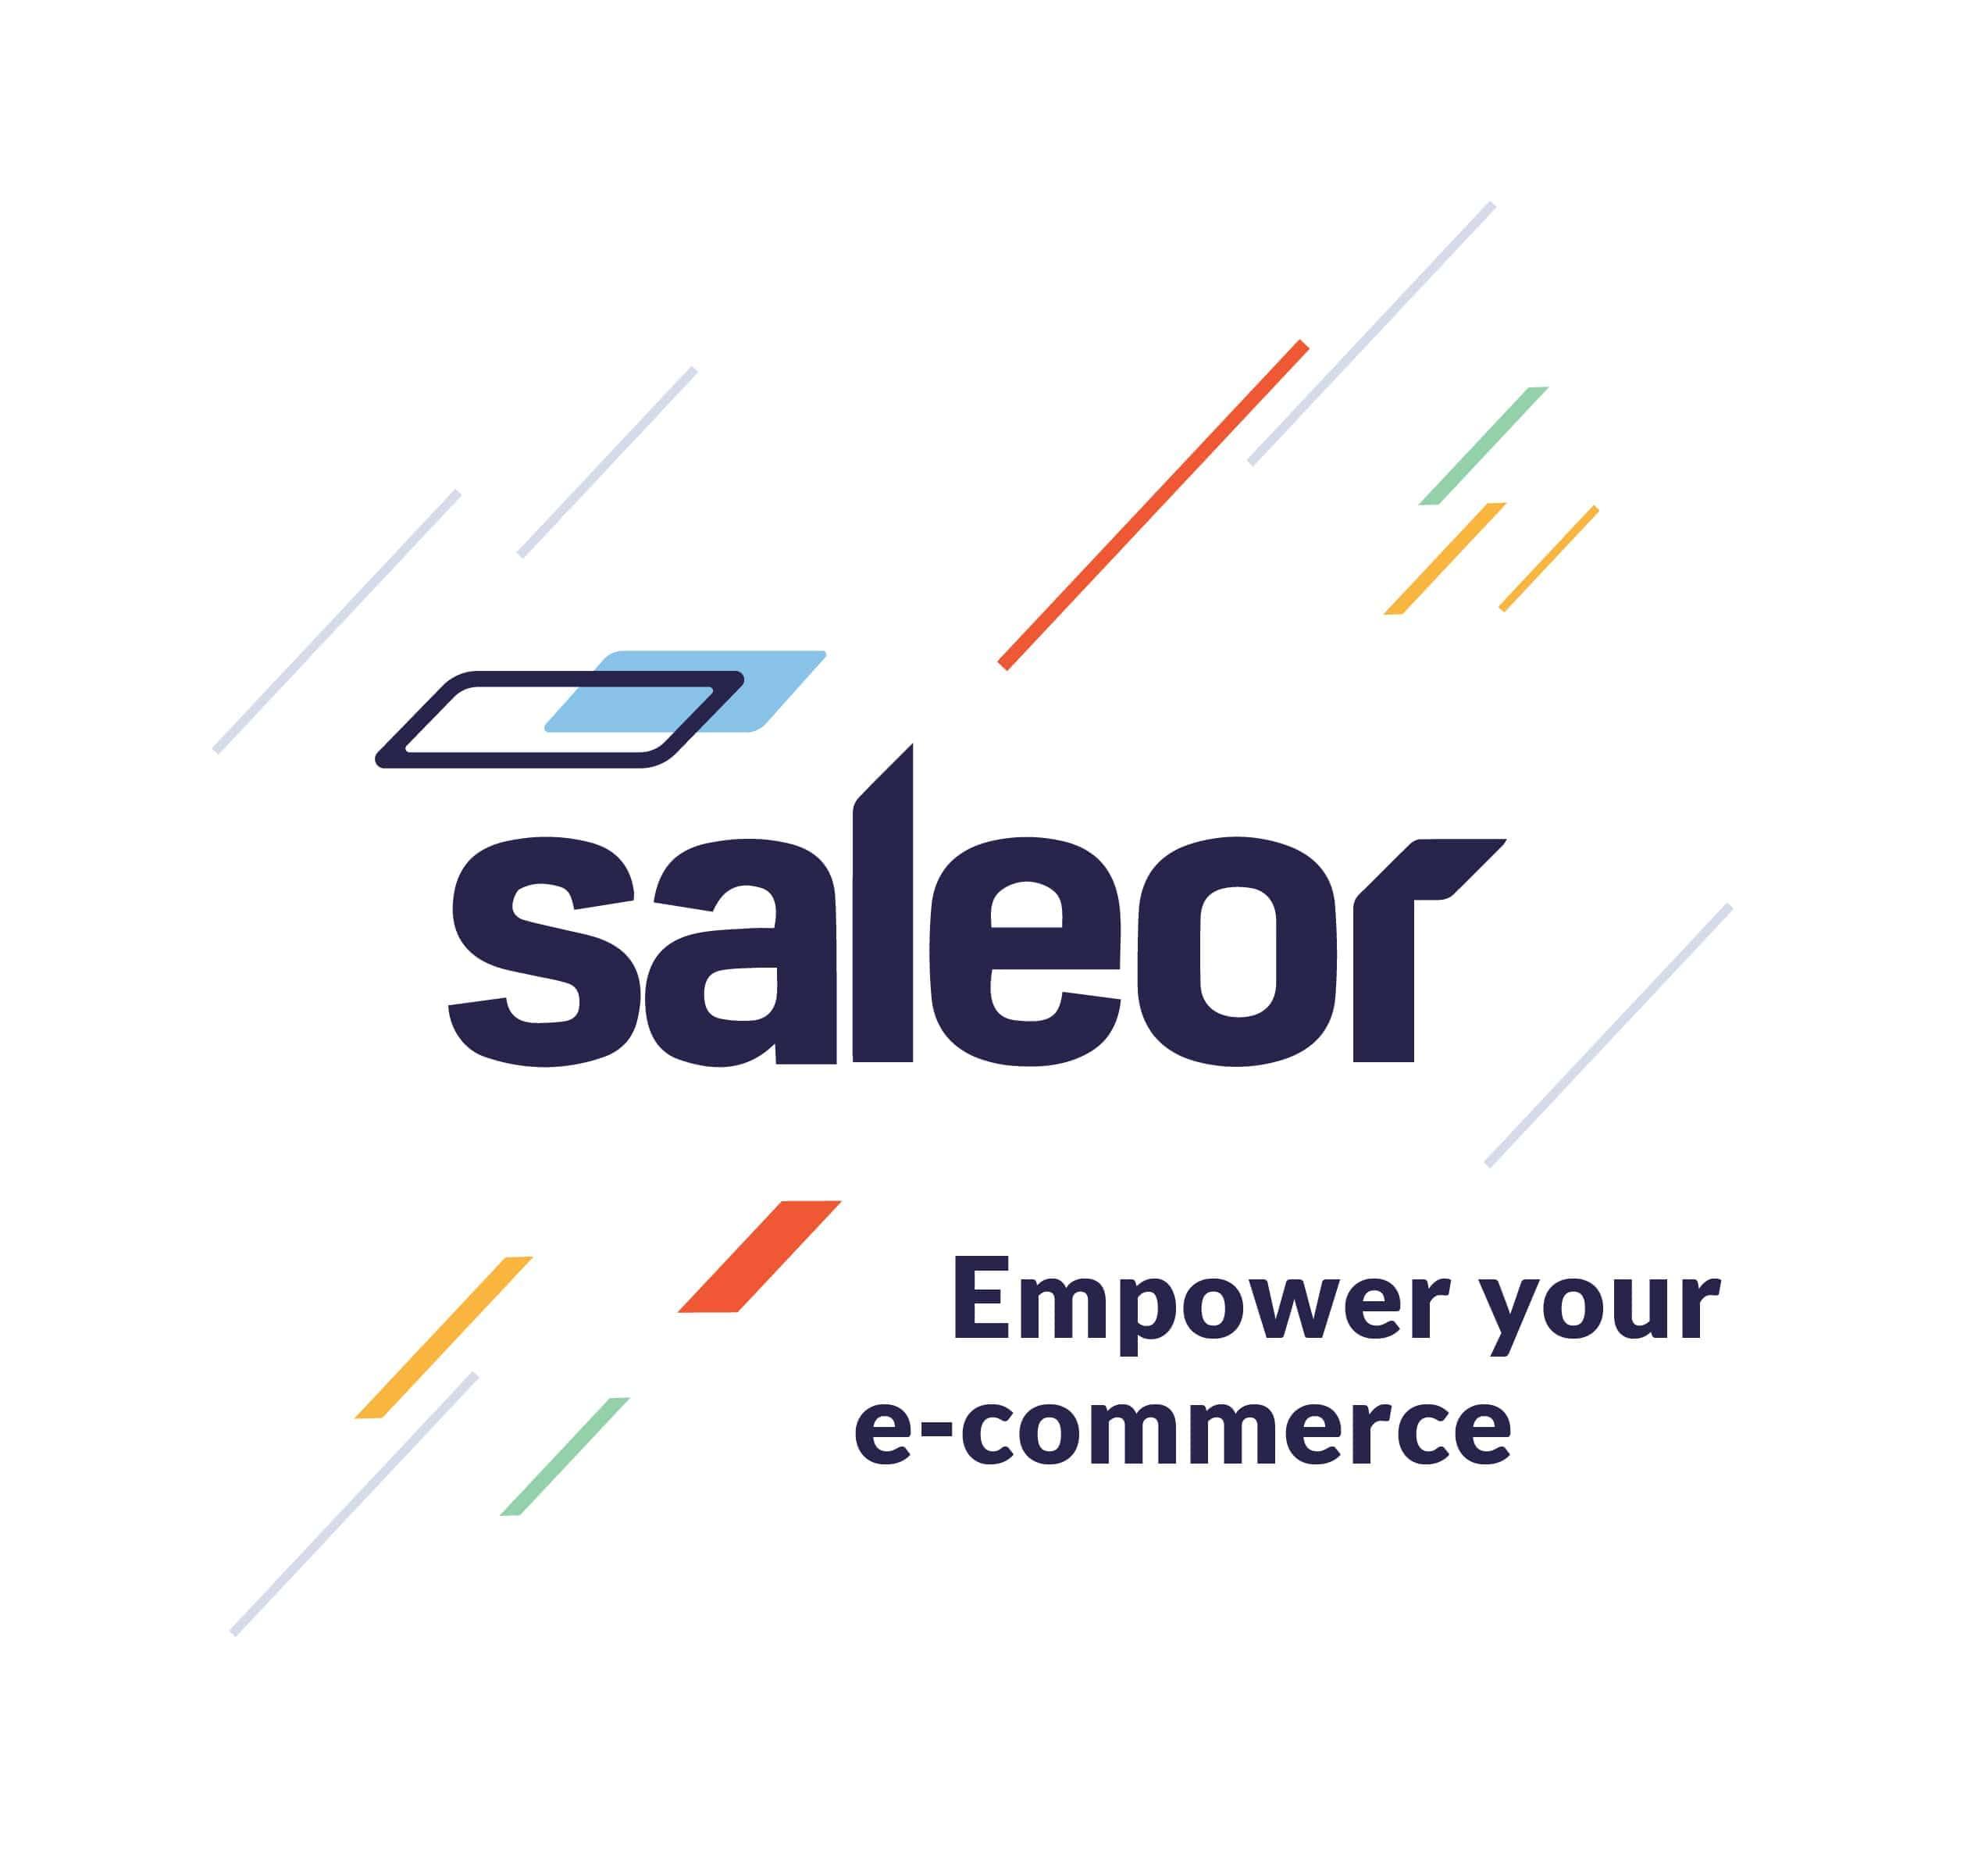 Saleor. Empower your e-commerce